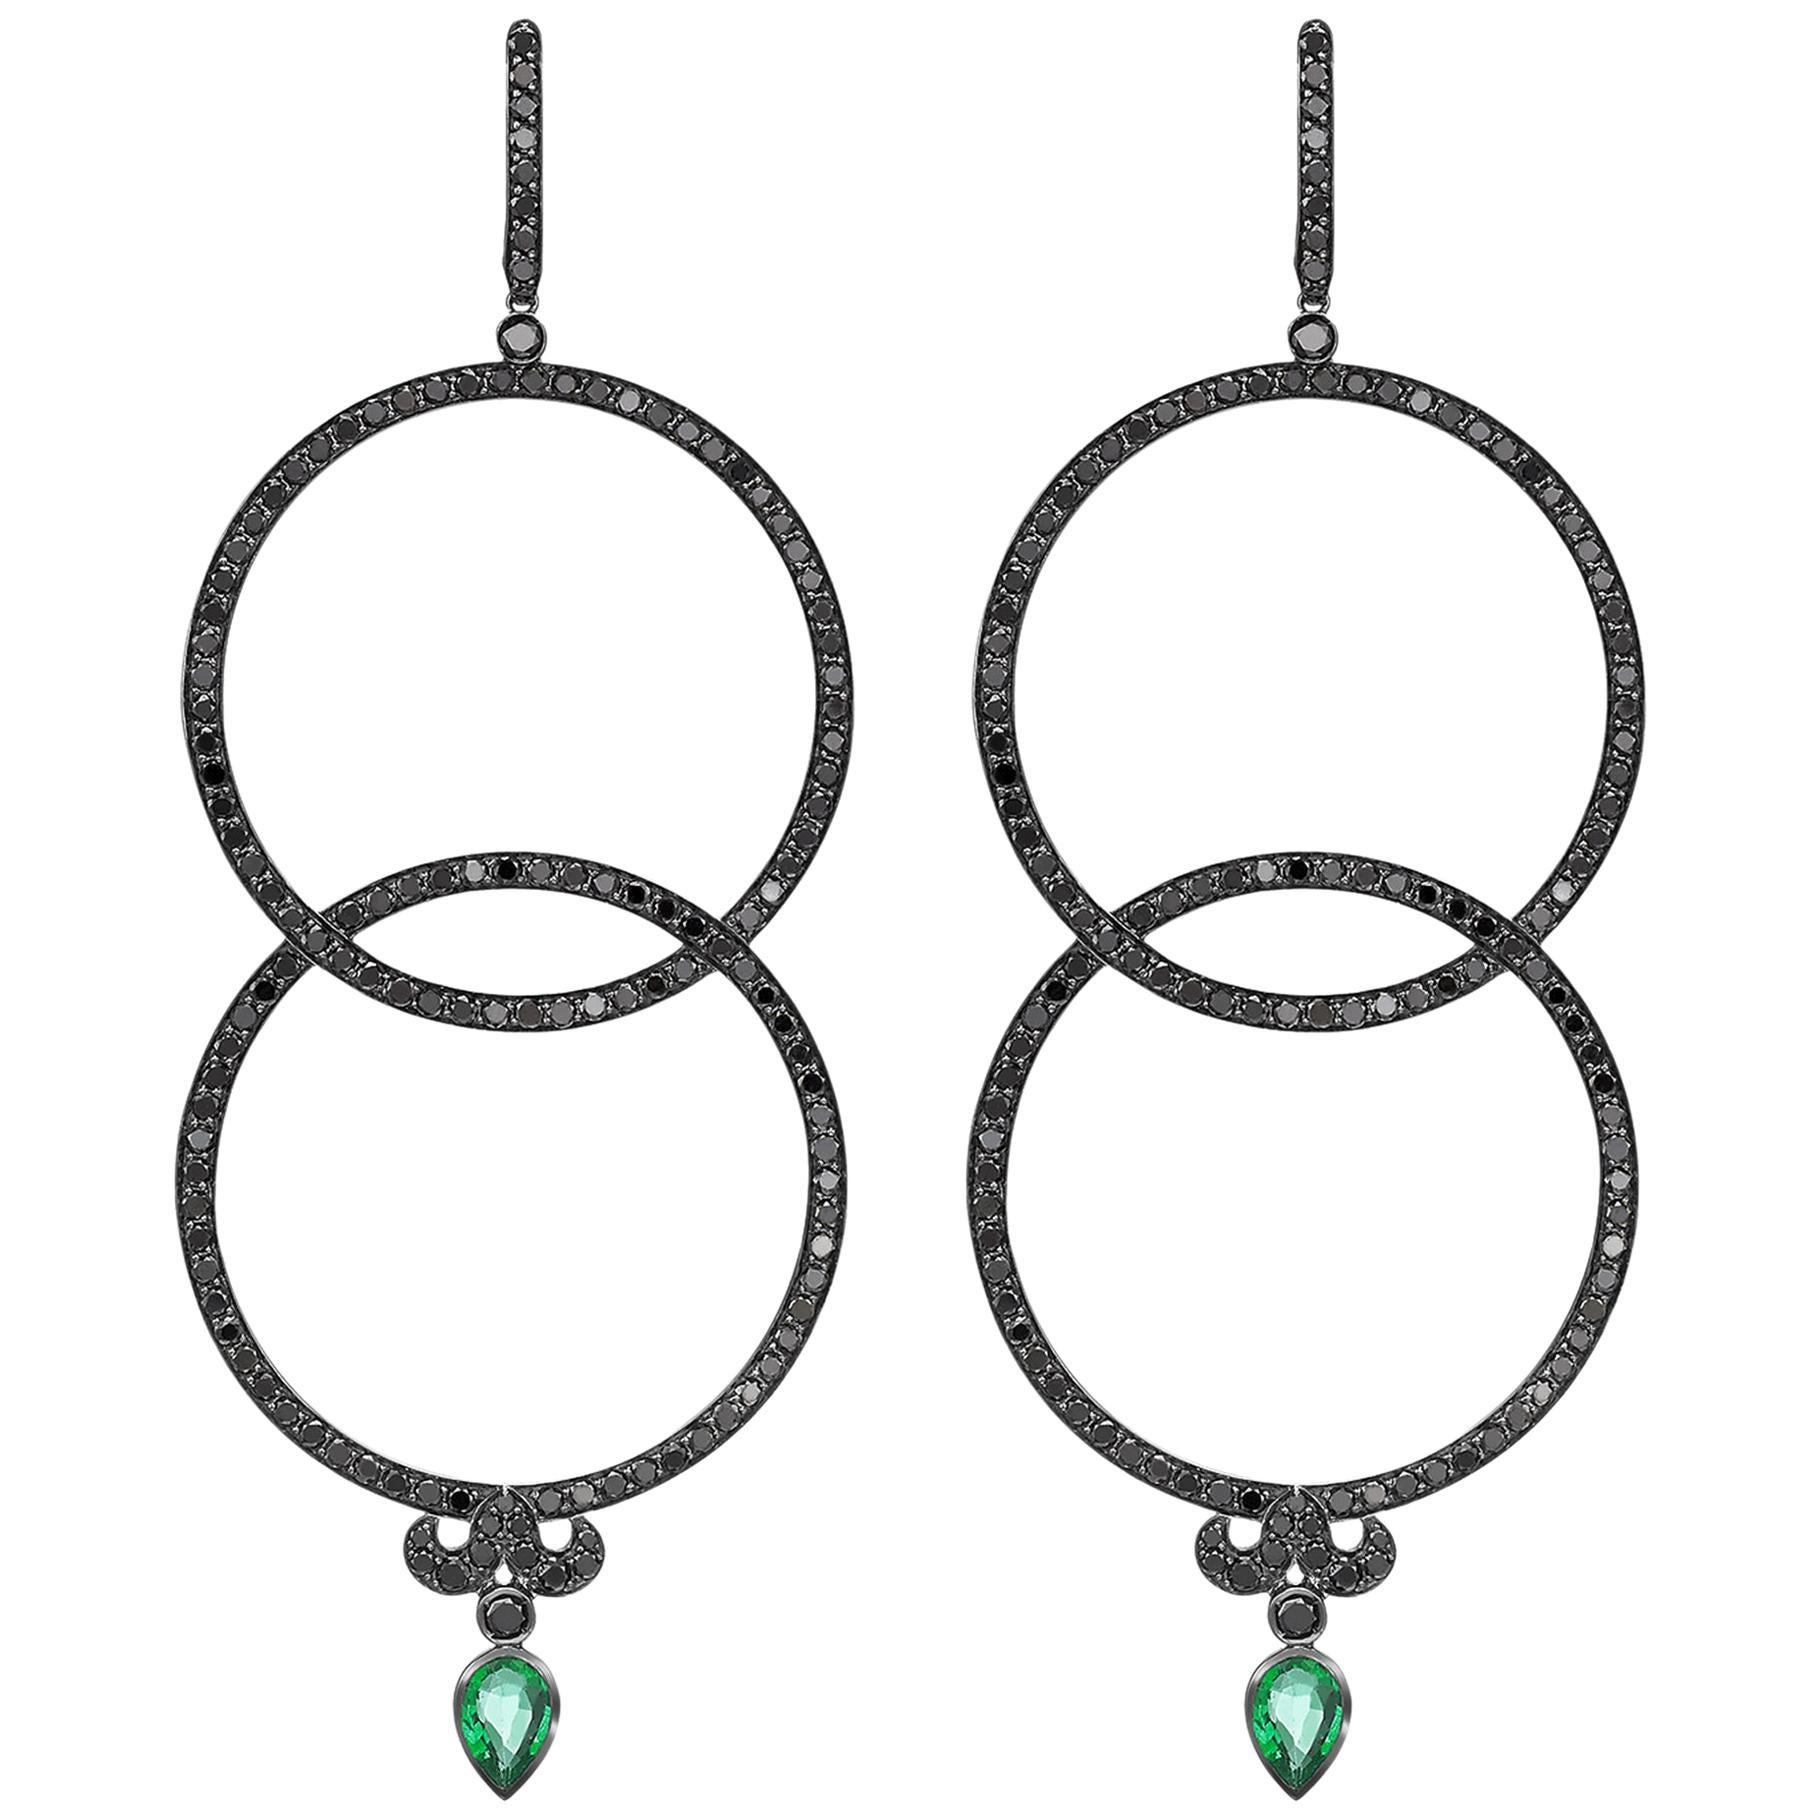 Sybarite Jewellery Earrings 18 Karat Gold 5.5 Carat Diamonds 1.2 Carat Emeralds